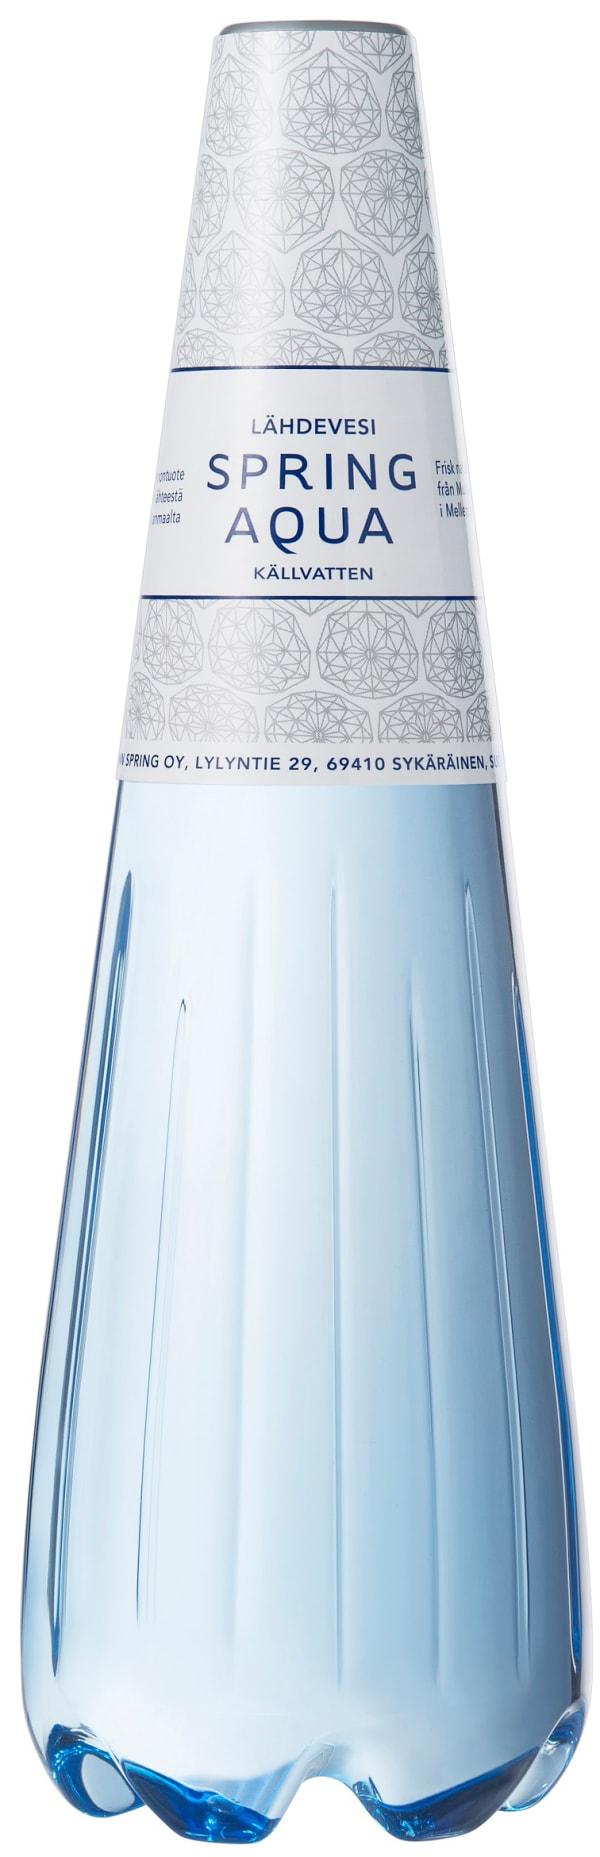 Spring Aqua Lähdevesi plastic bottle